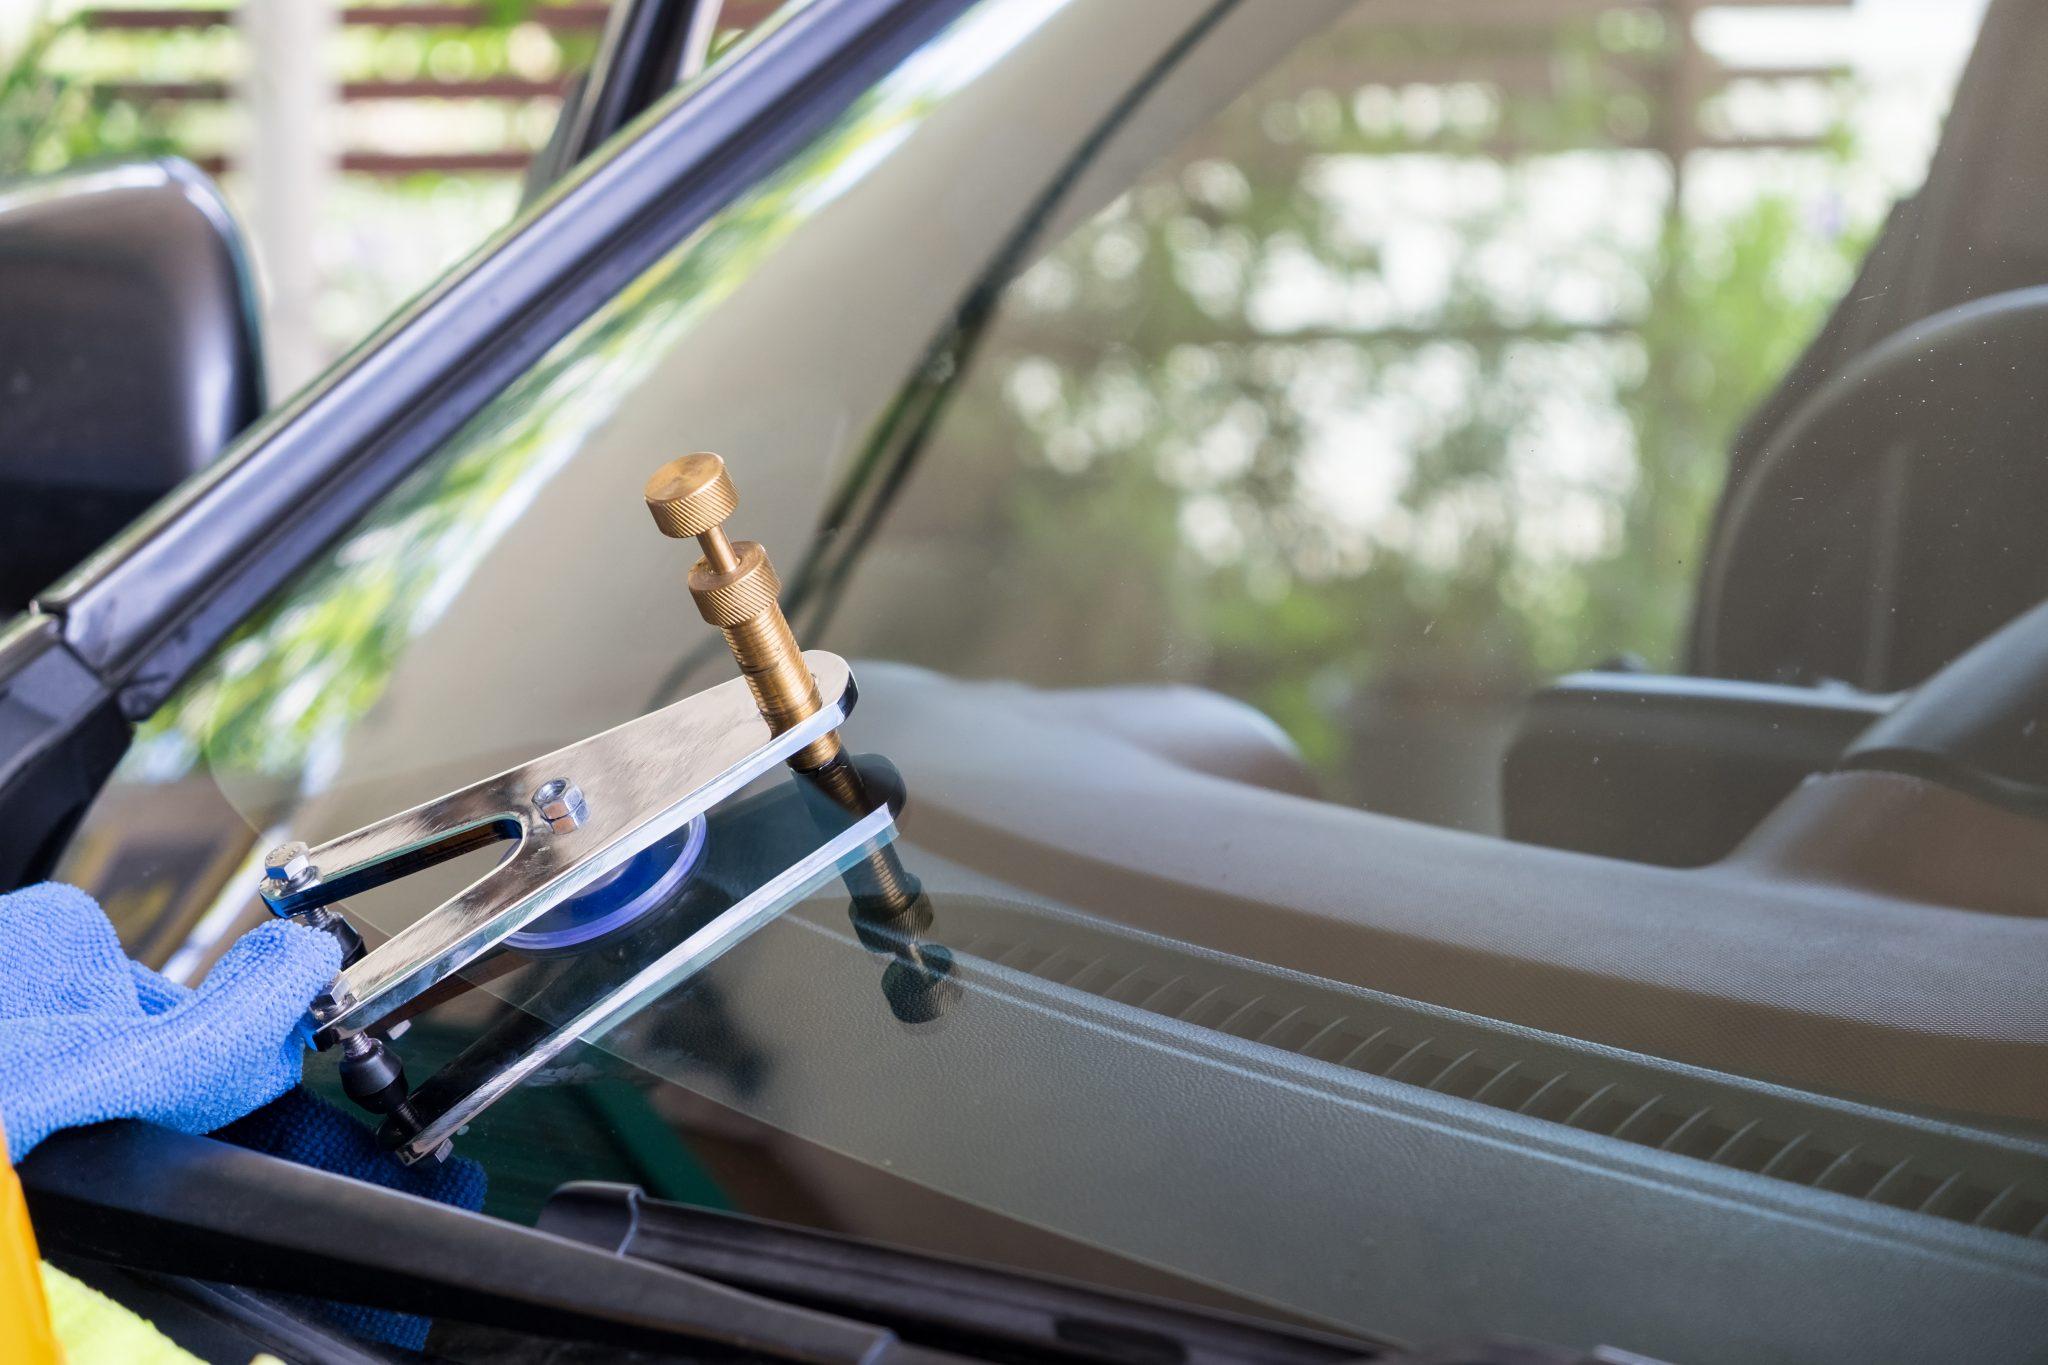 Autoglas - Austausch der Windschutzscheibe